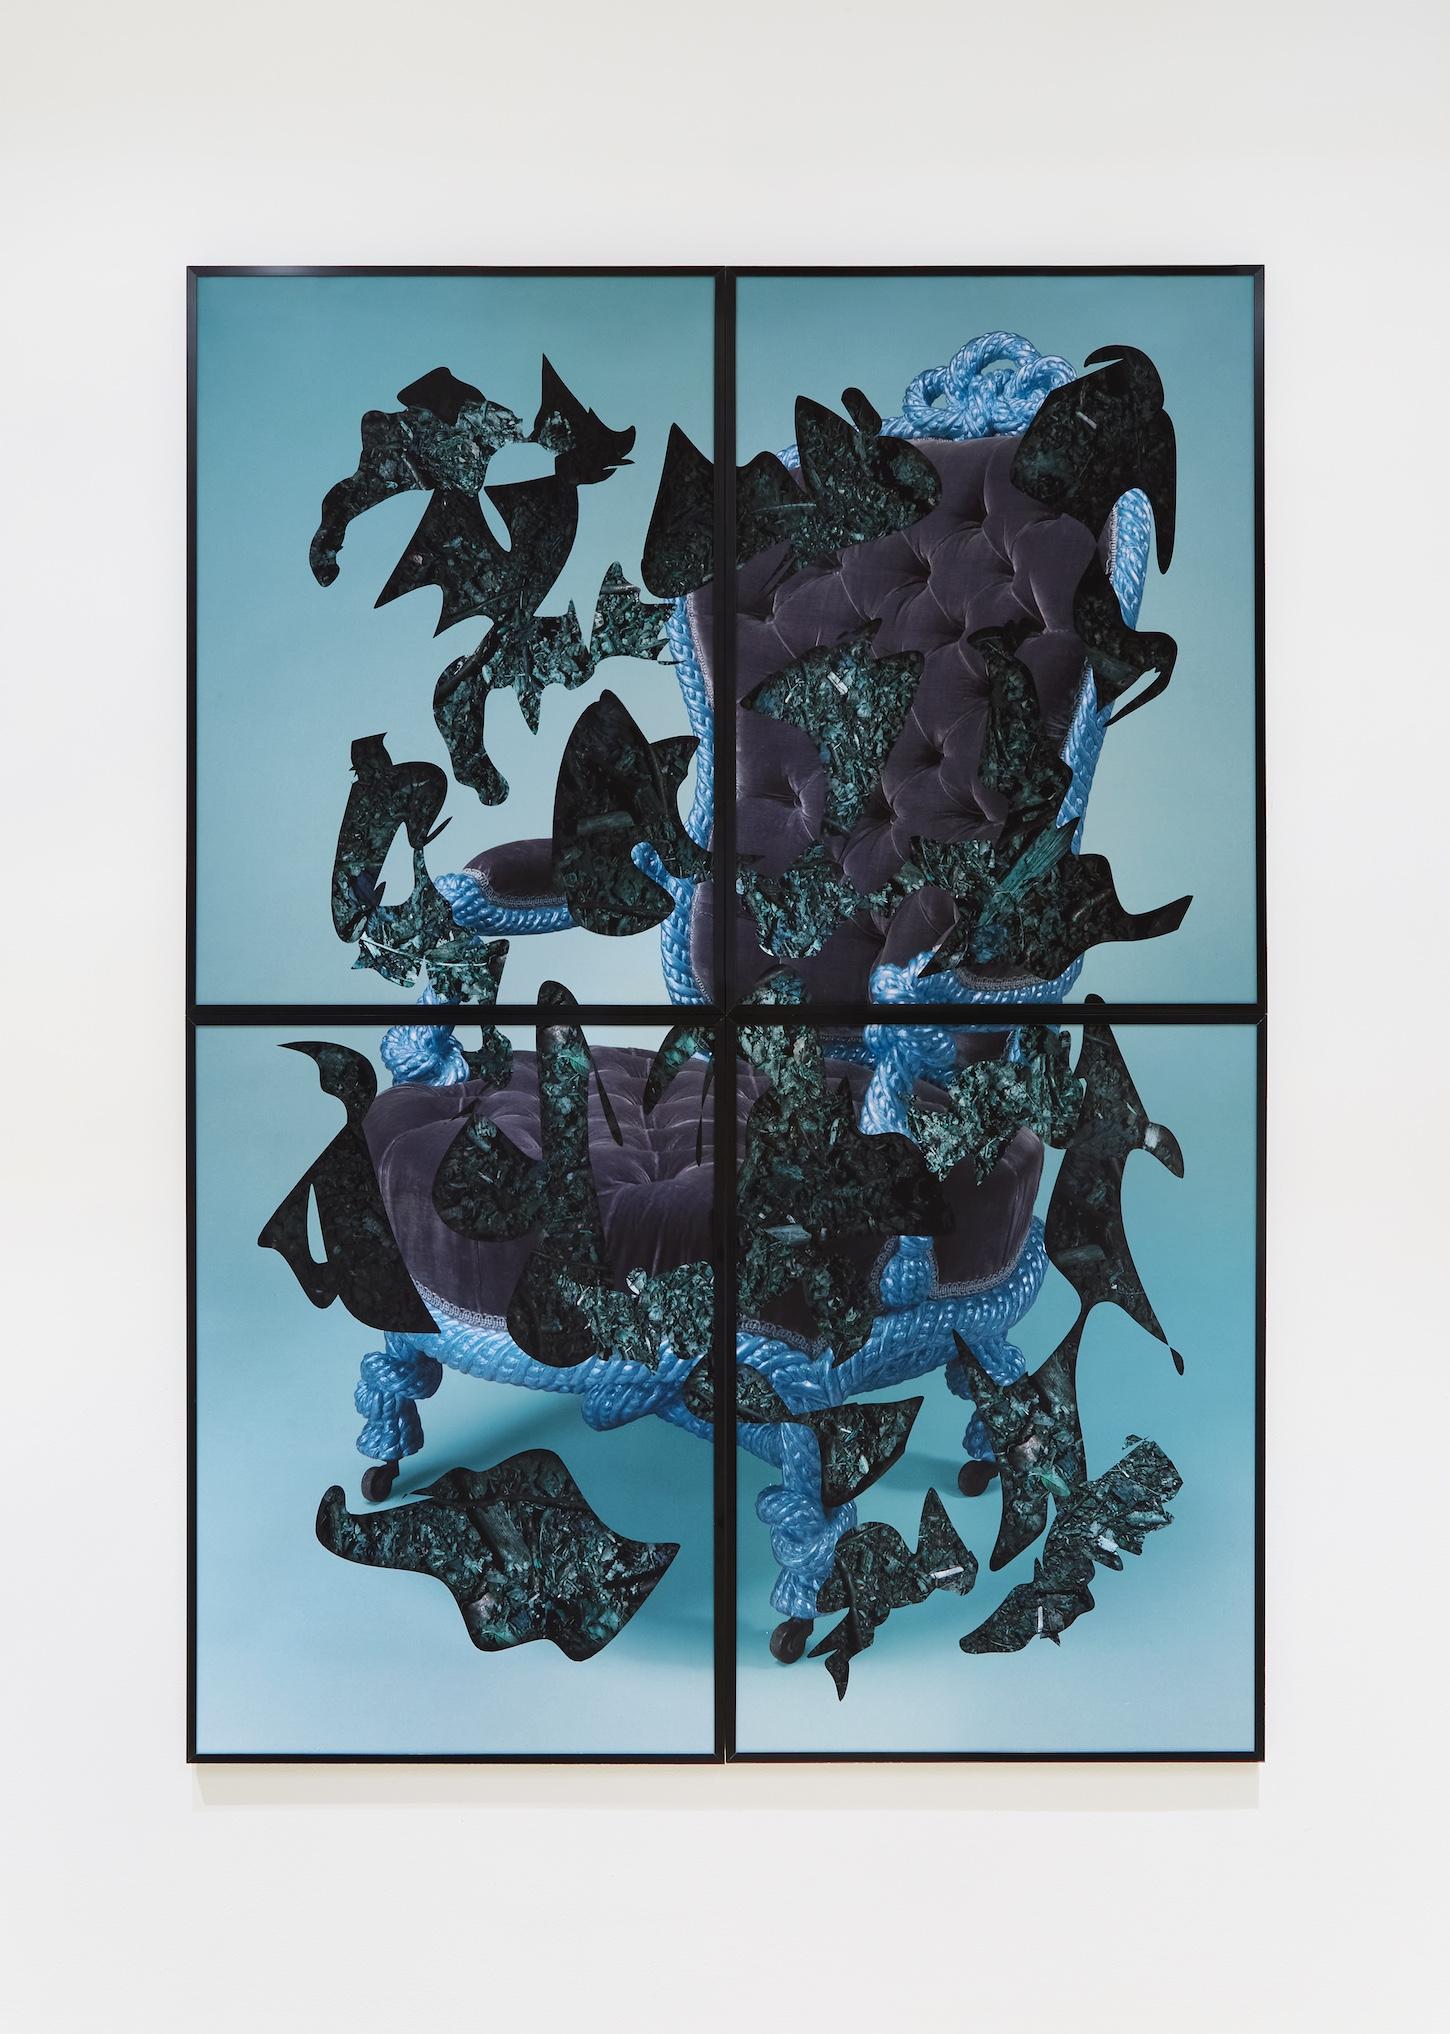 'Deep Down' Pigment print on archival matt. Aluminium frame. 140cm x 100cm